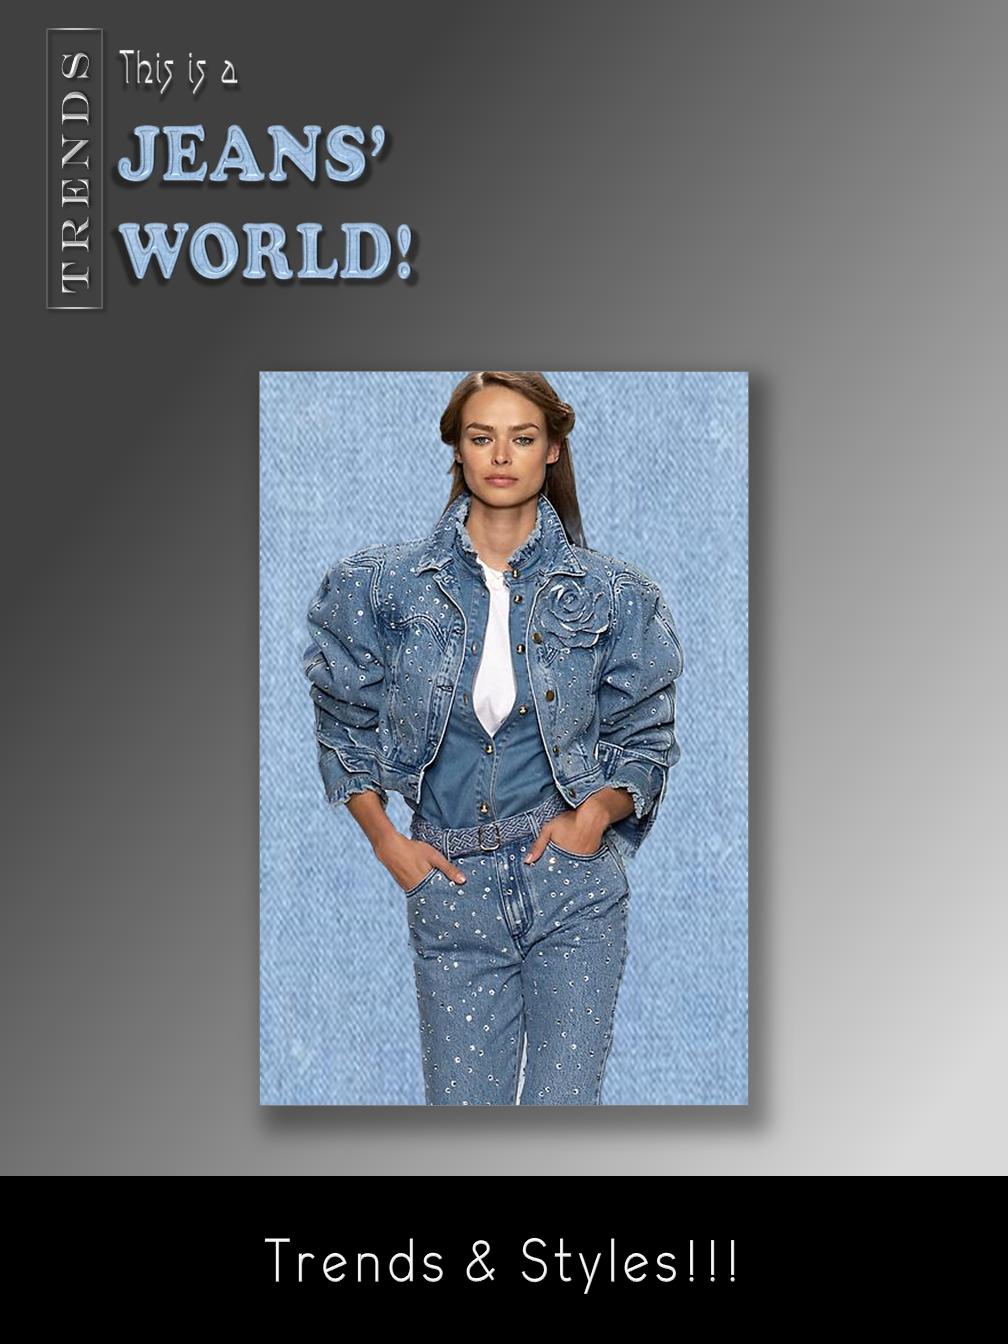 Jeans World